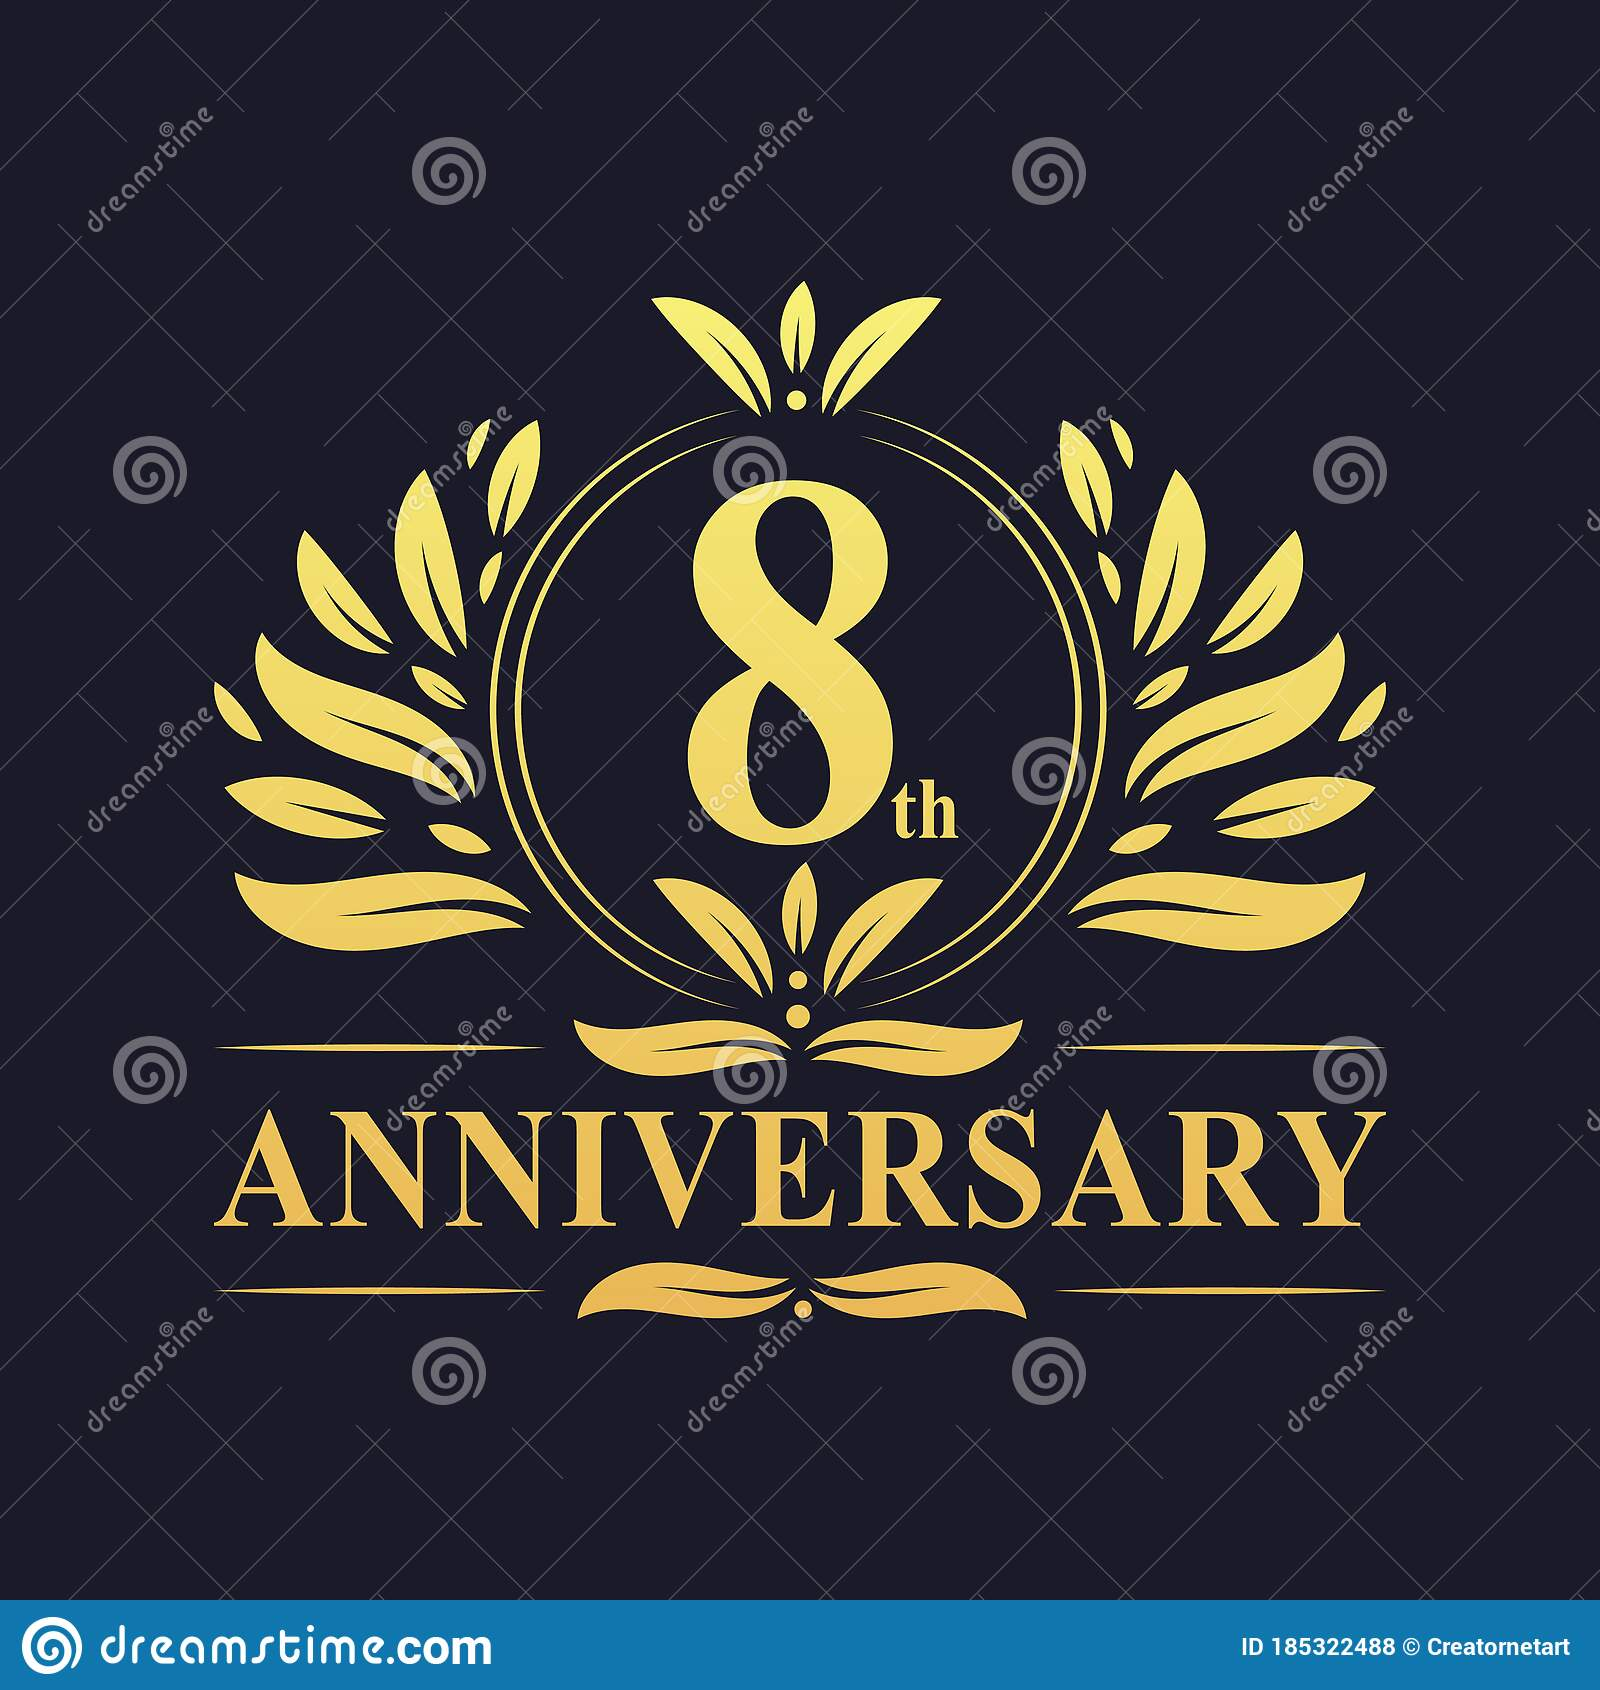 8th Anniversary Design Luxurious Golden Color 8 Years Anniversary Logo Stock Vector Illustration Of Vintage Elegant 185322488